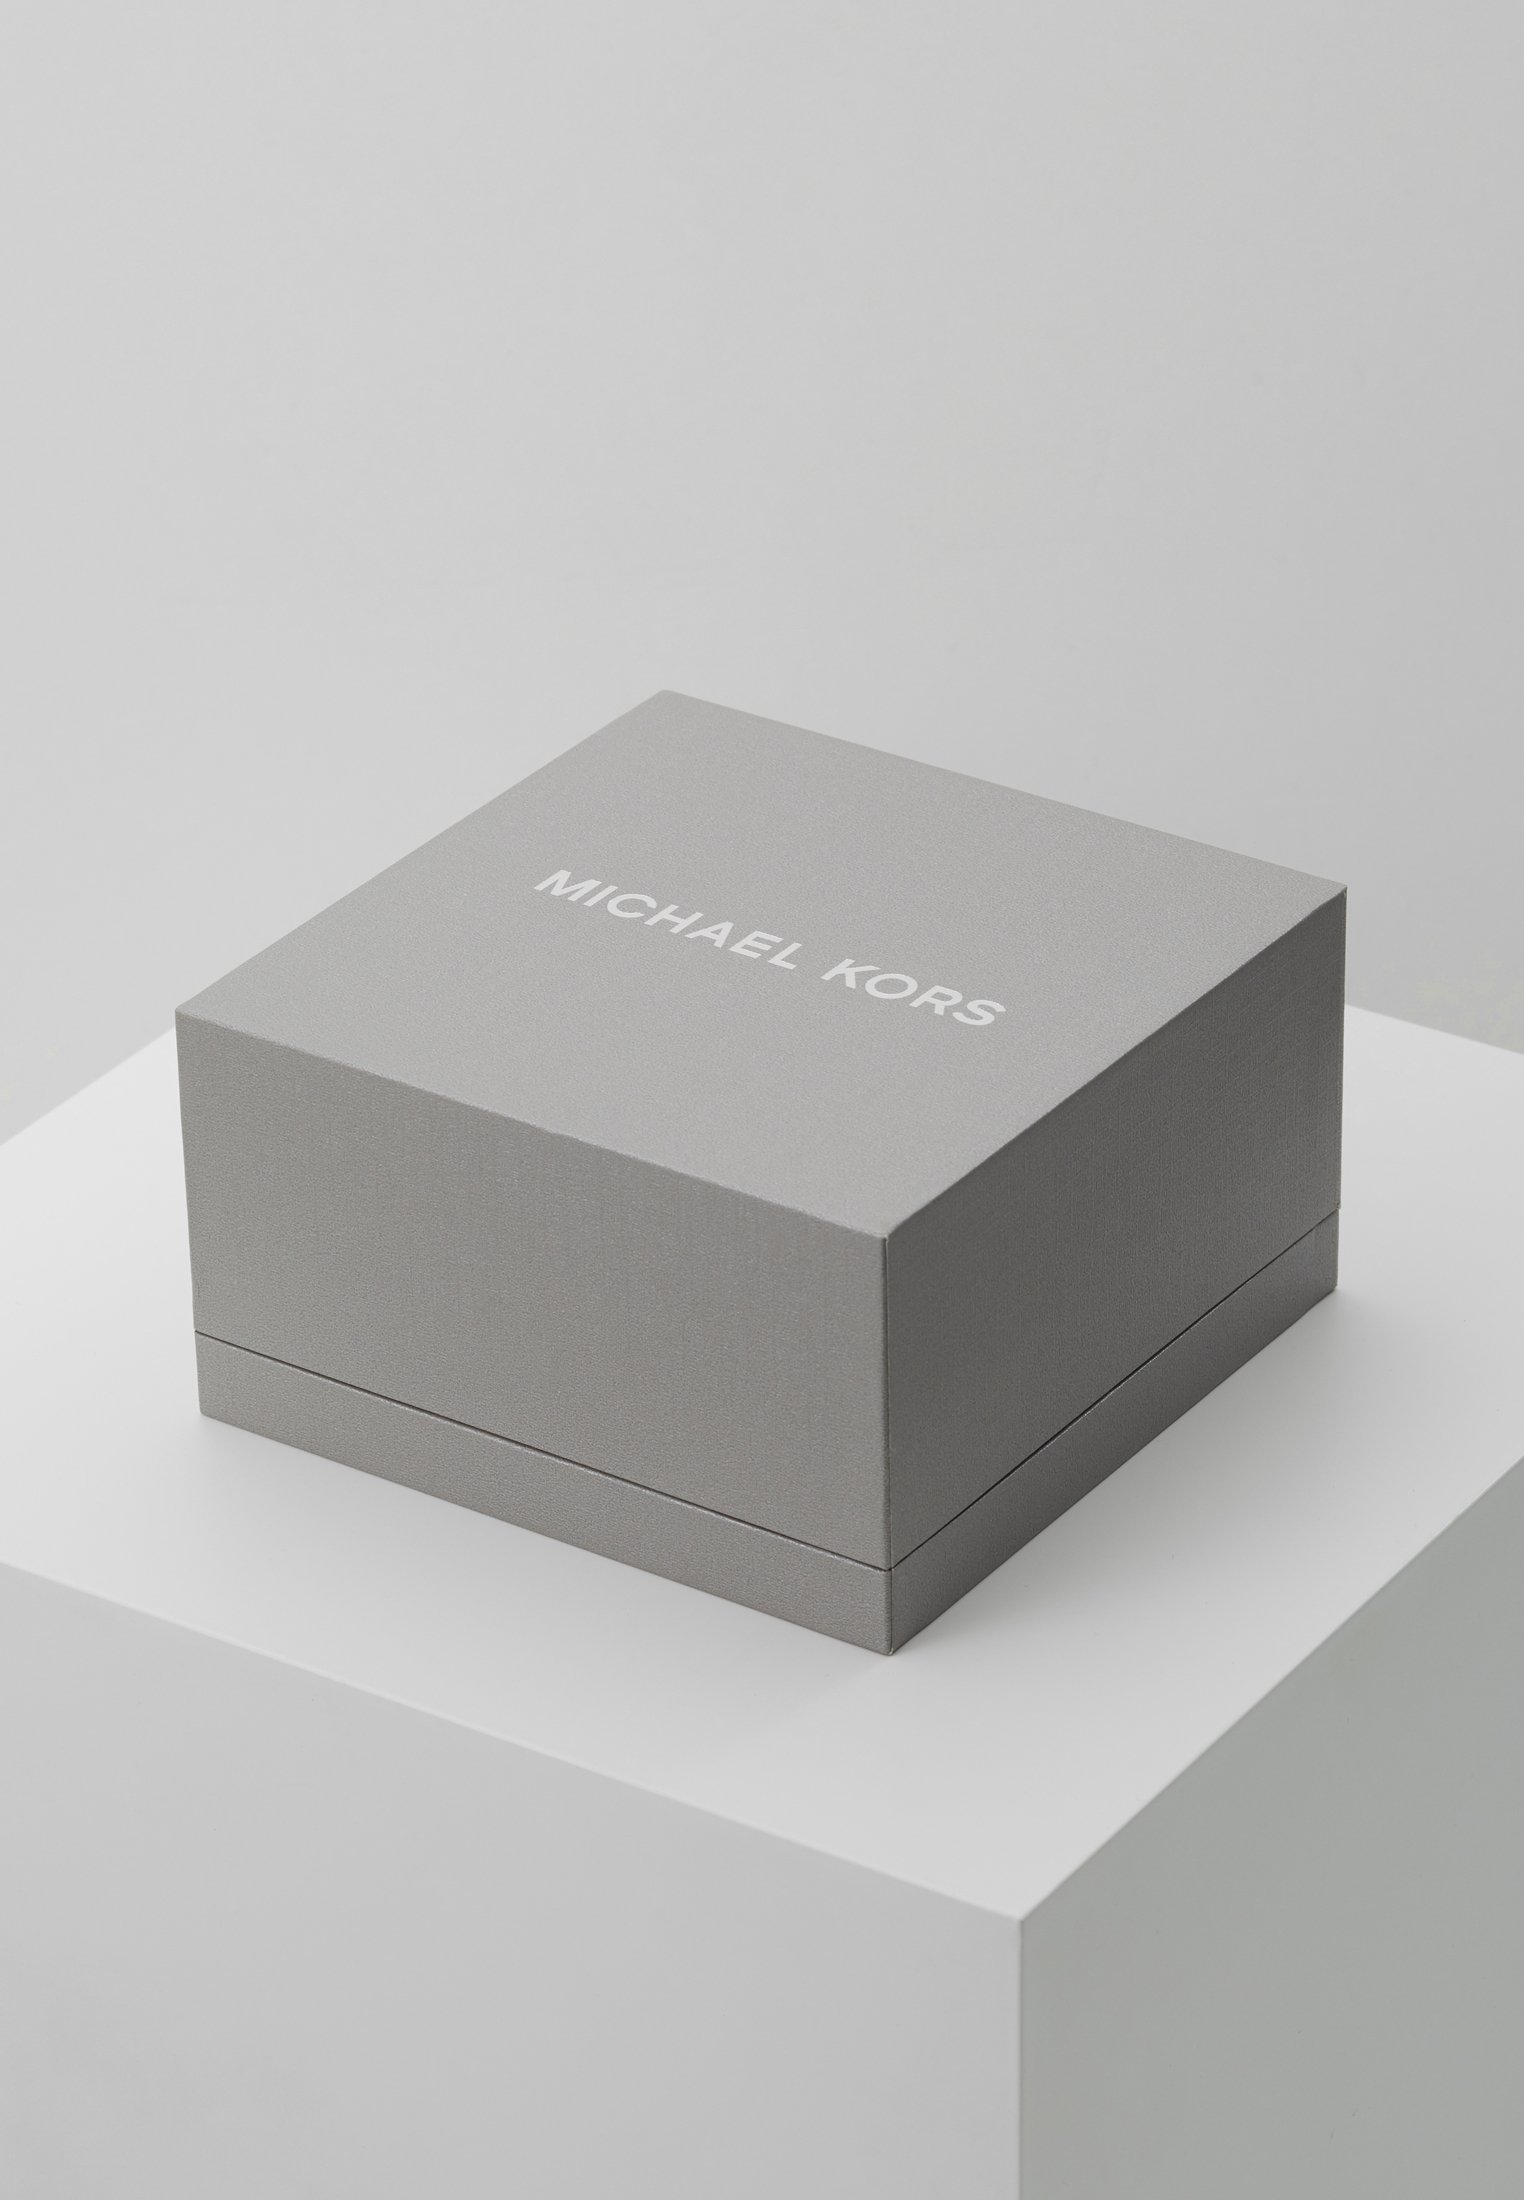 Michael Kors Halskette - Silver-coloured/silber